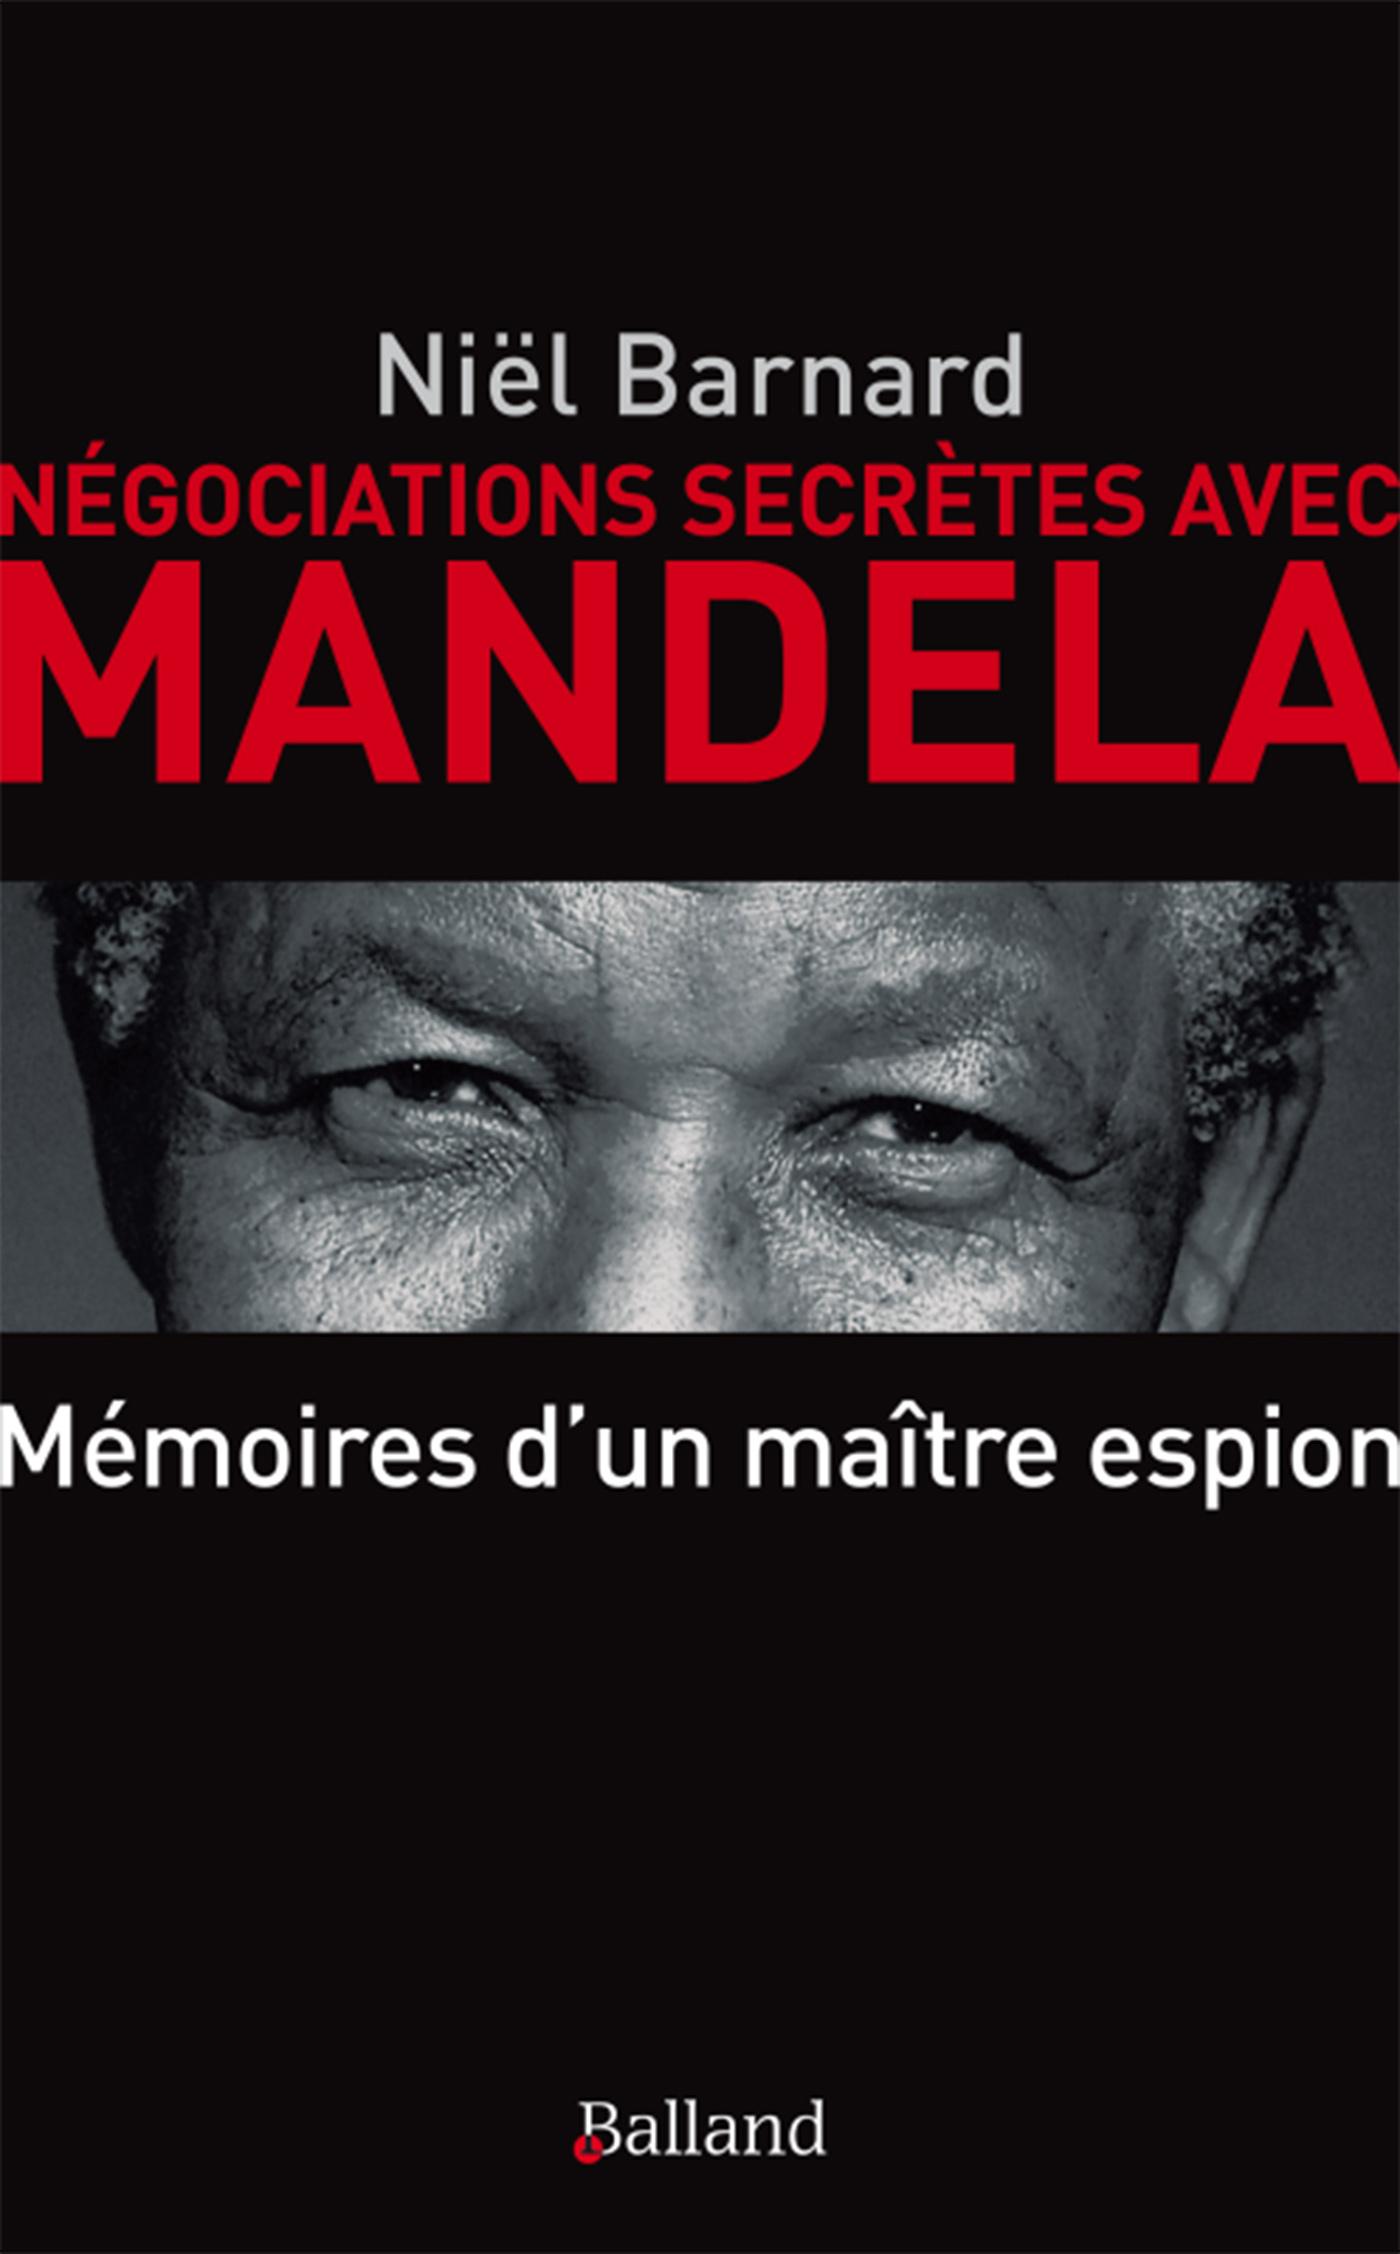 NEGOCIATIONS SECRETES AVEC MANDELA MEMOIRES D'UN PATRON DE L'ESPIONNAGE